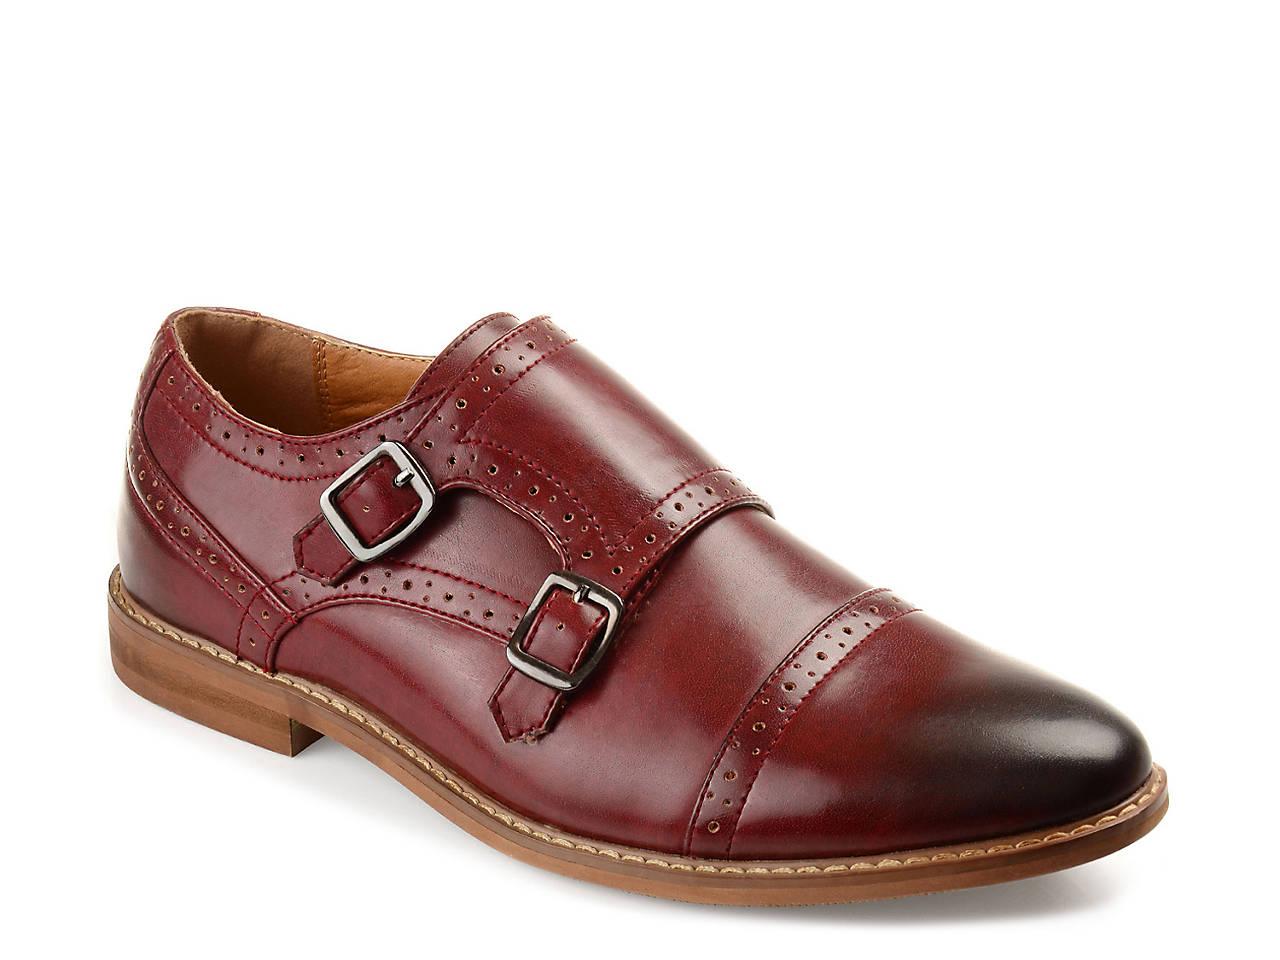 discount purchase Vance Co. Wayne Men's Monk ... Strap Dress Shoes visit ub0RD